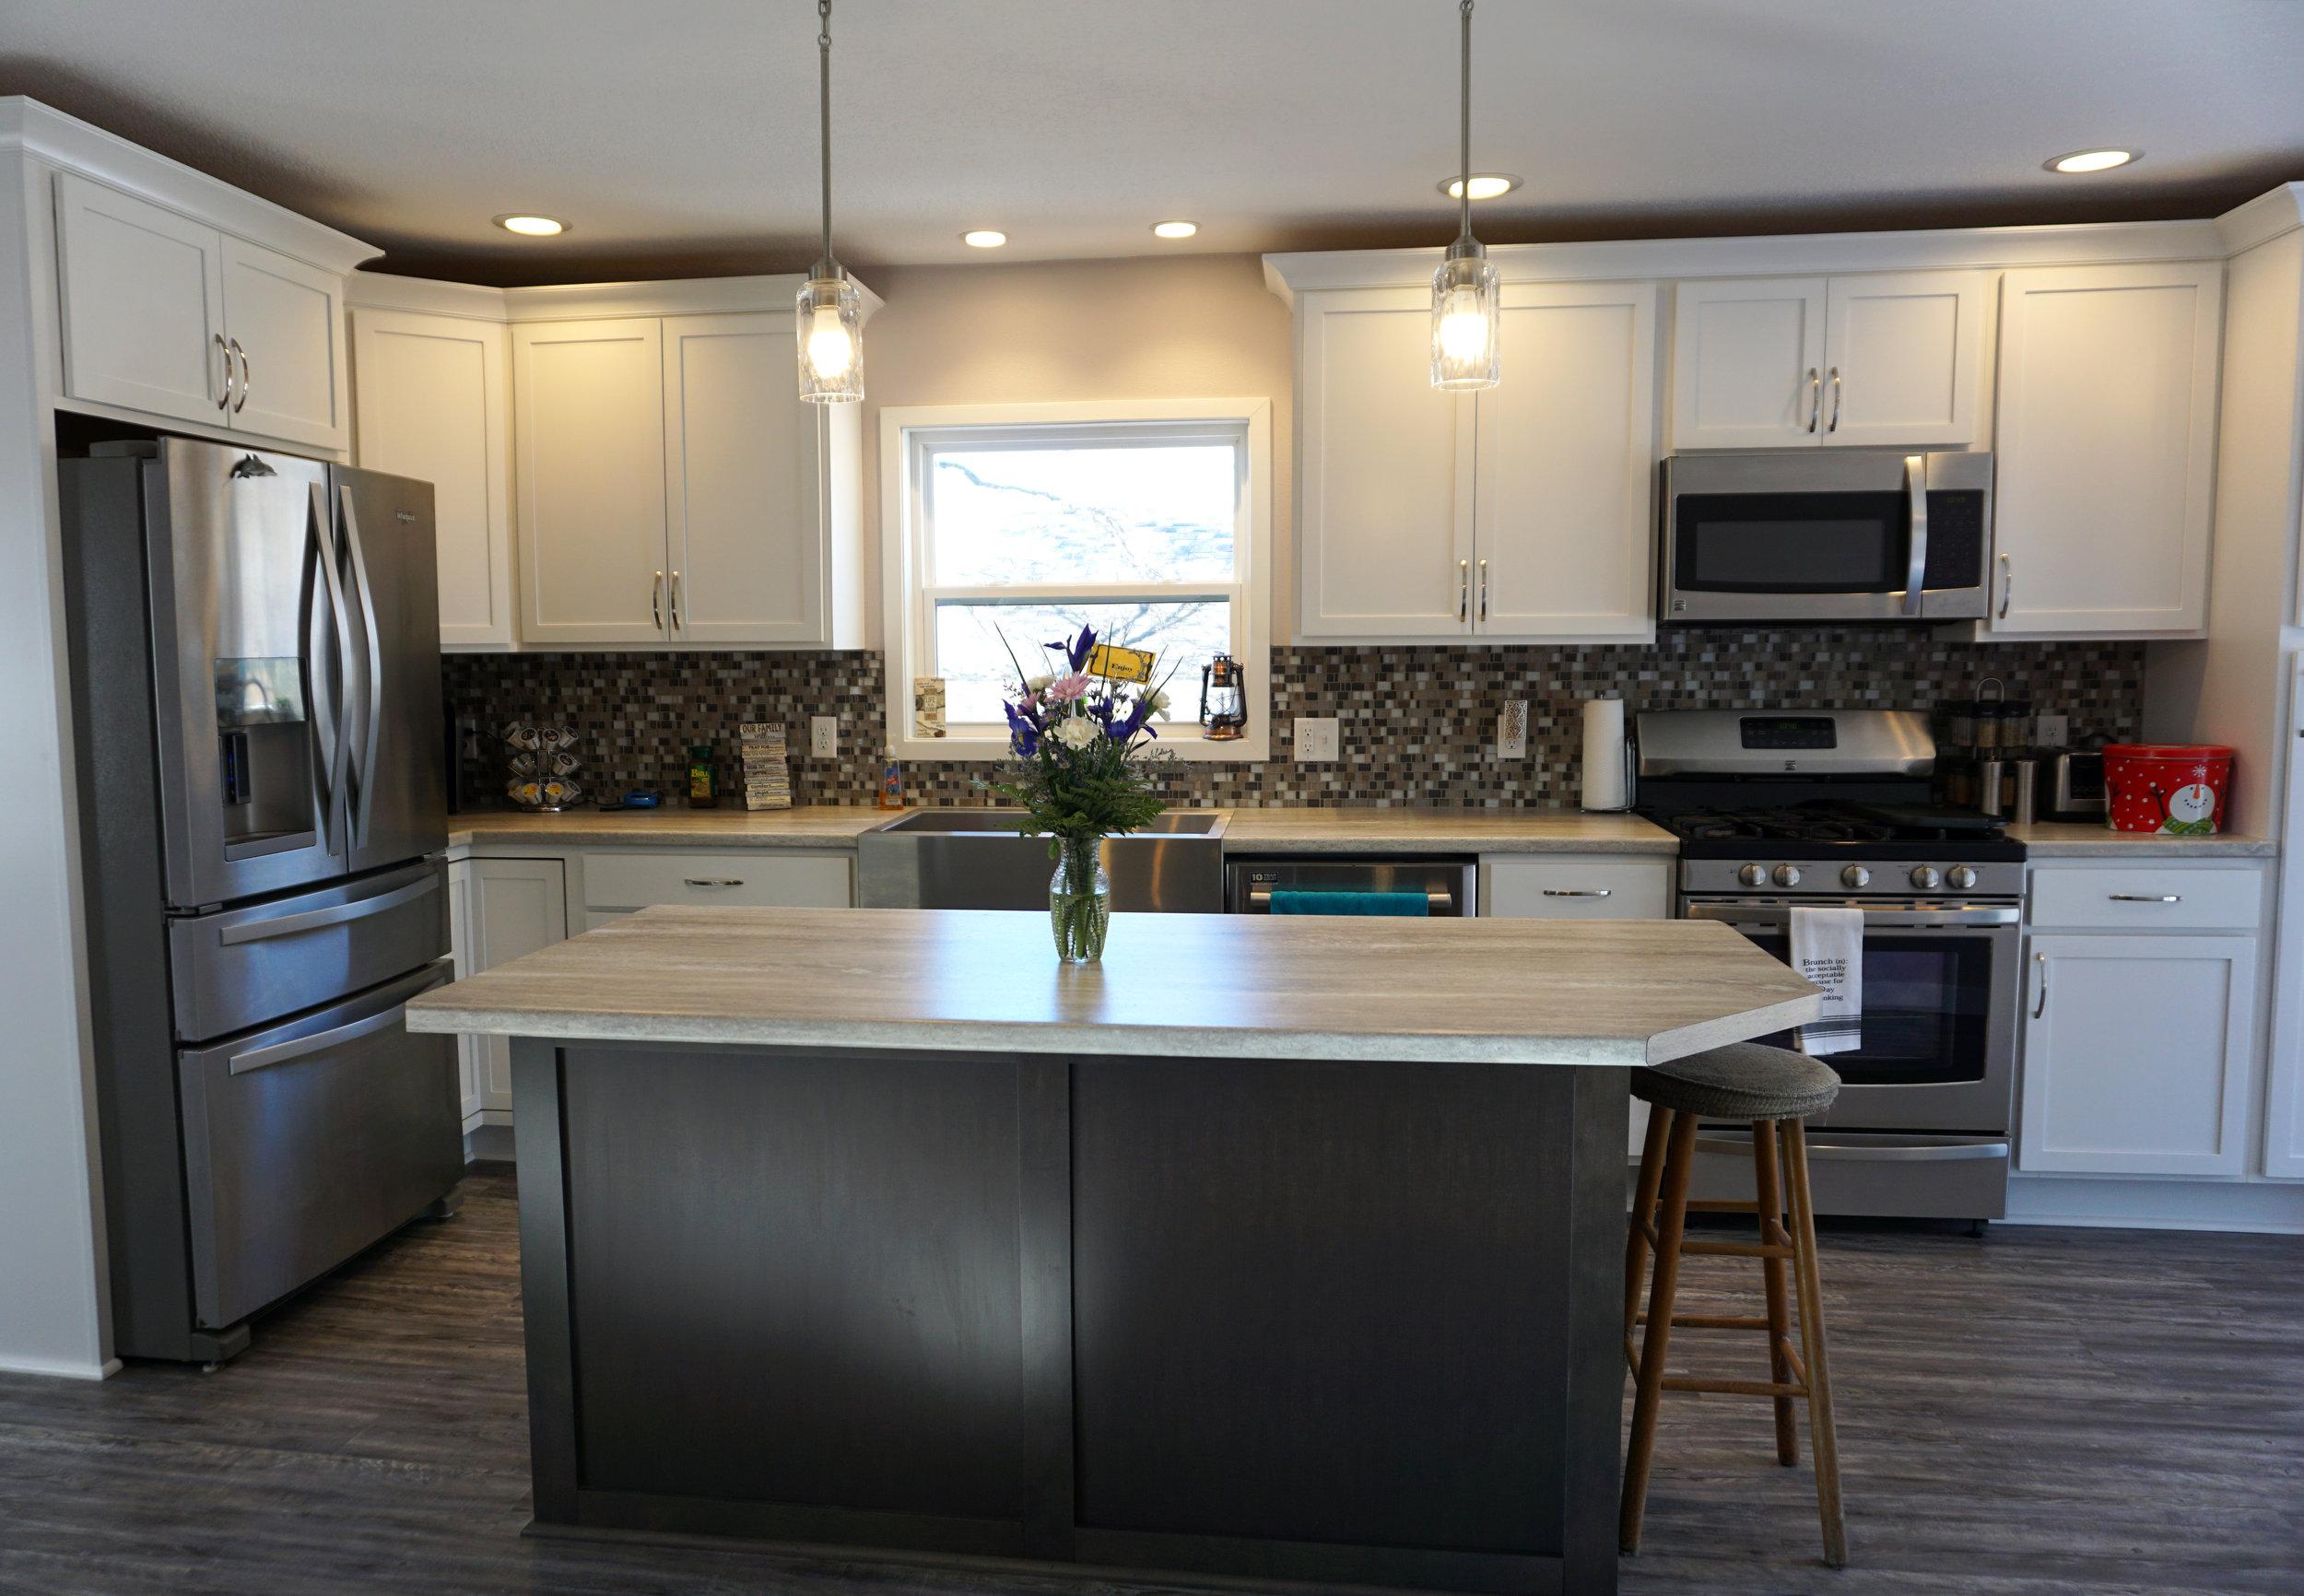 Painted White and Maple cabinets, Ceramic Tileworks NIghtfall : Moonbeam